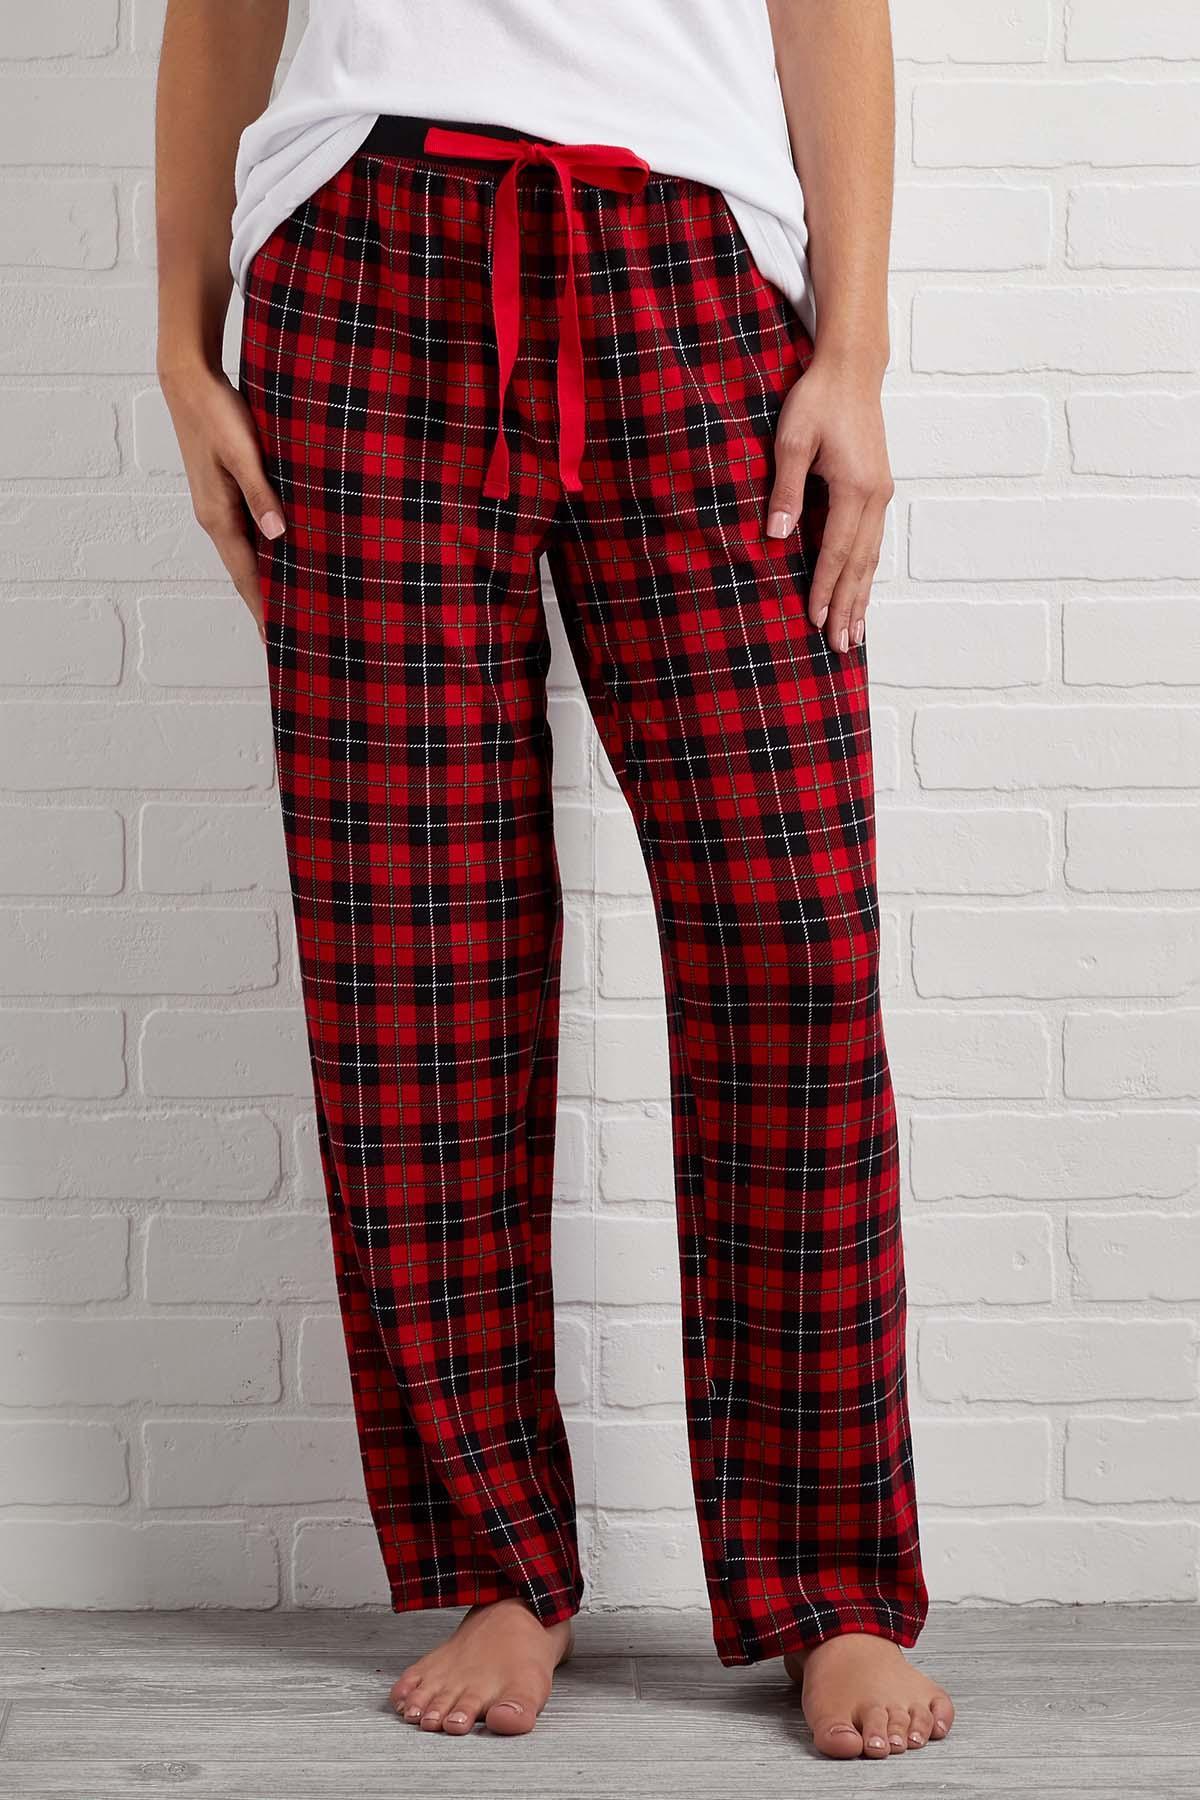 Festive Plaid Lounge Pants